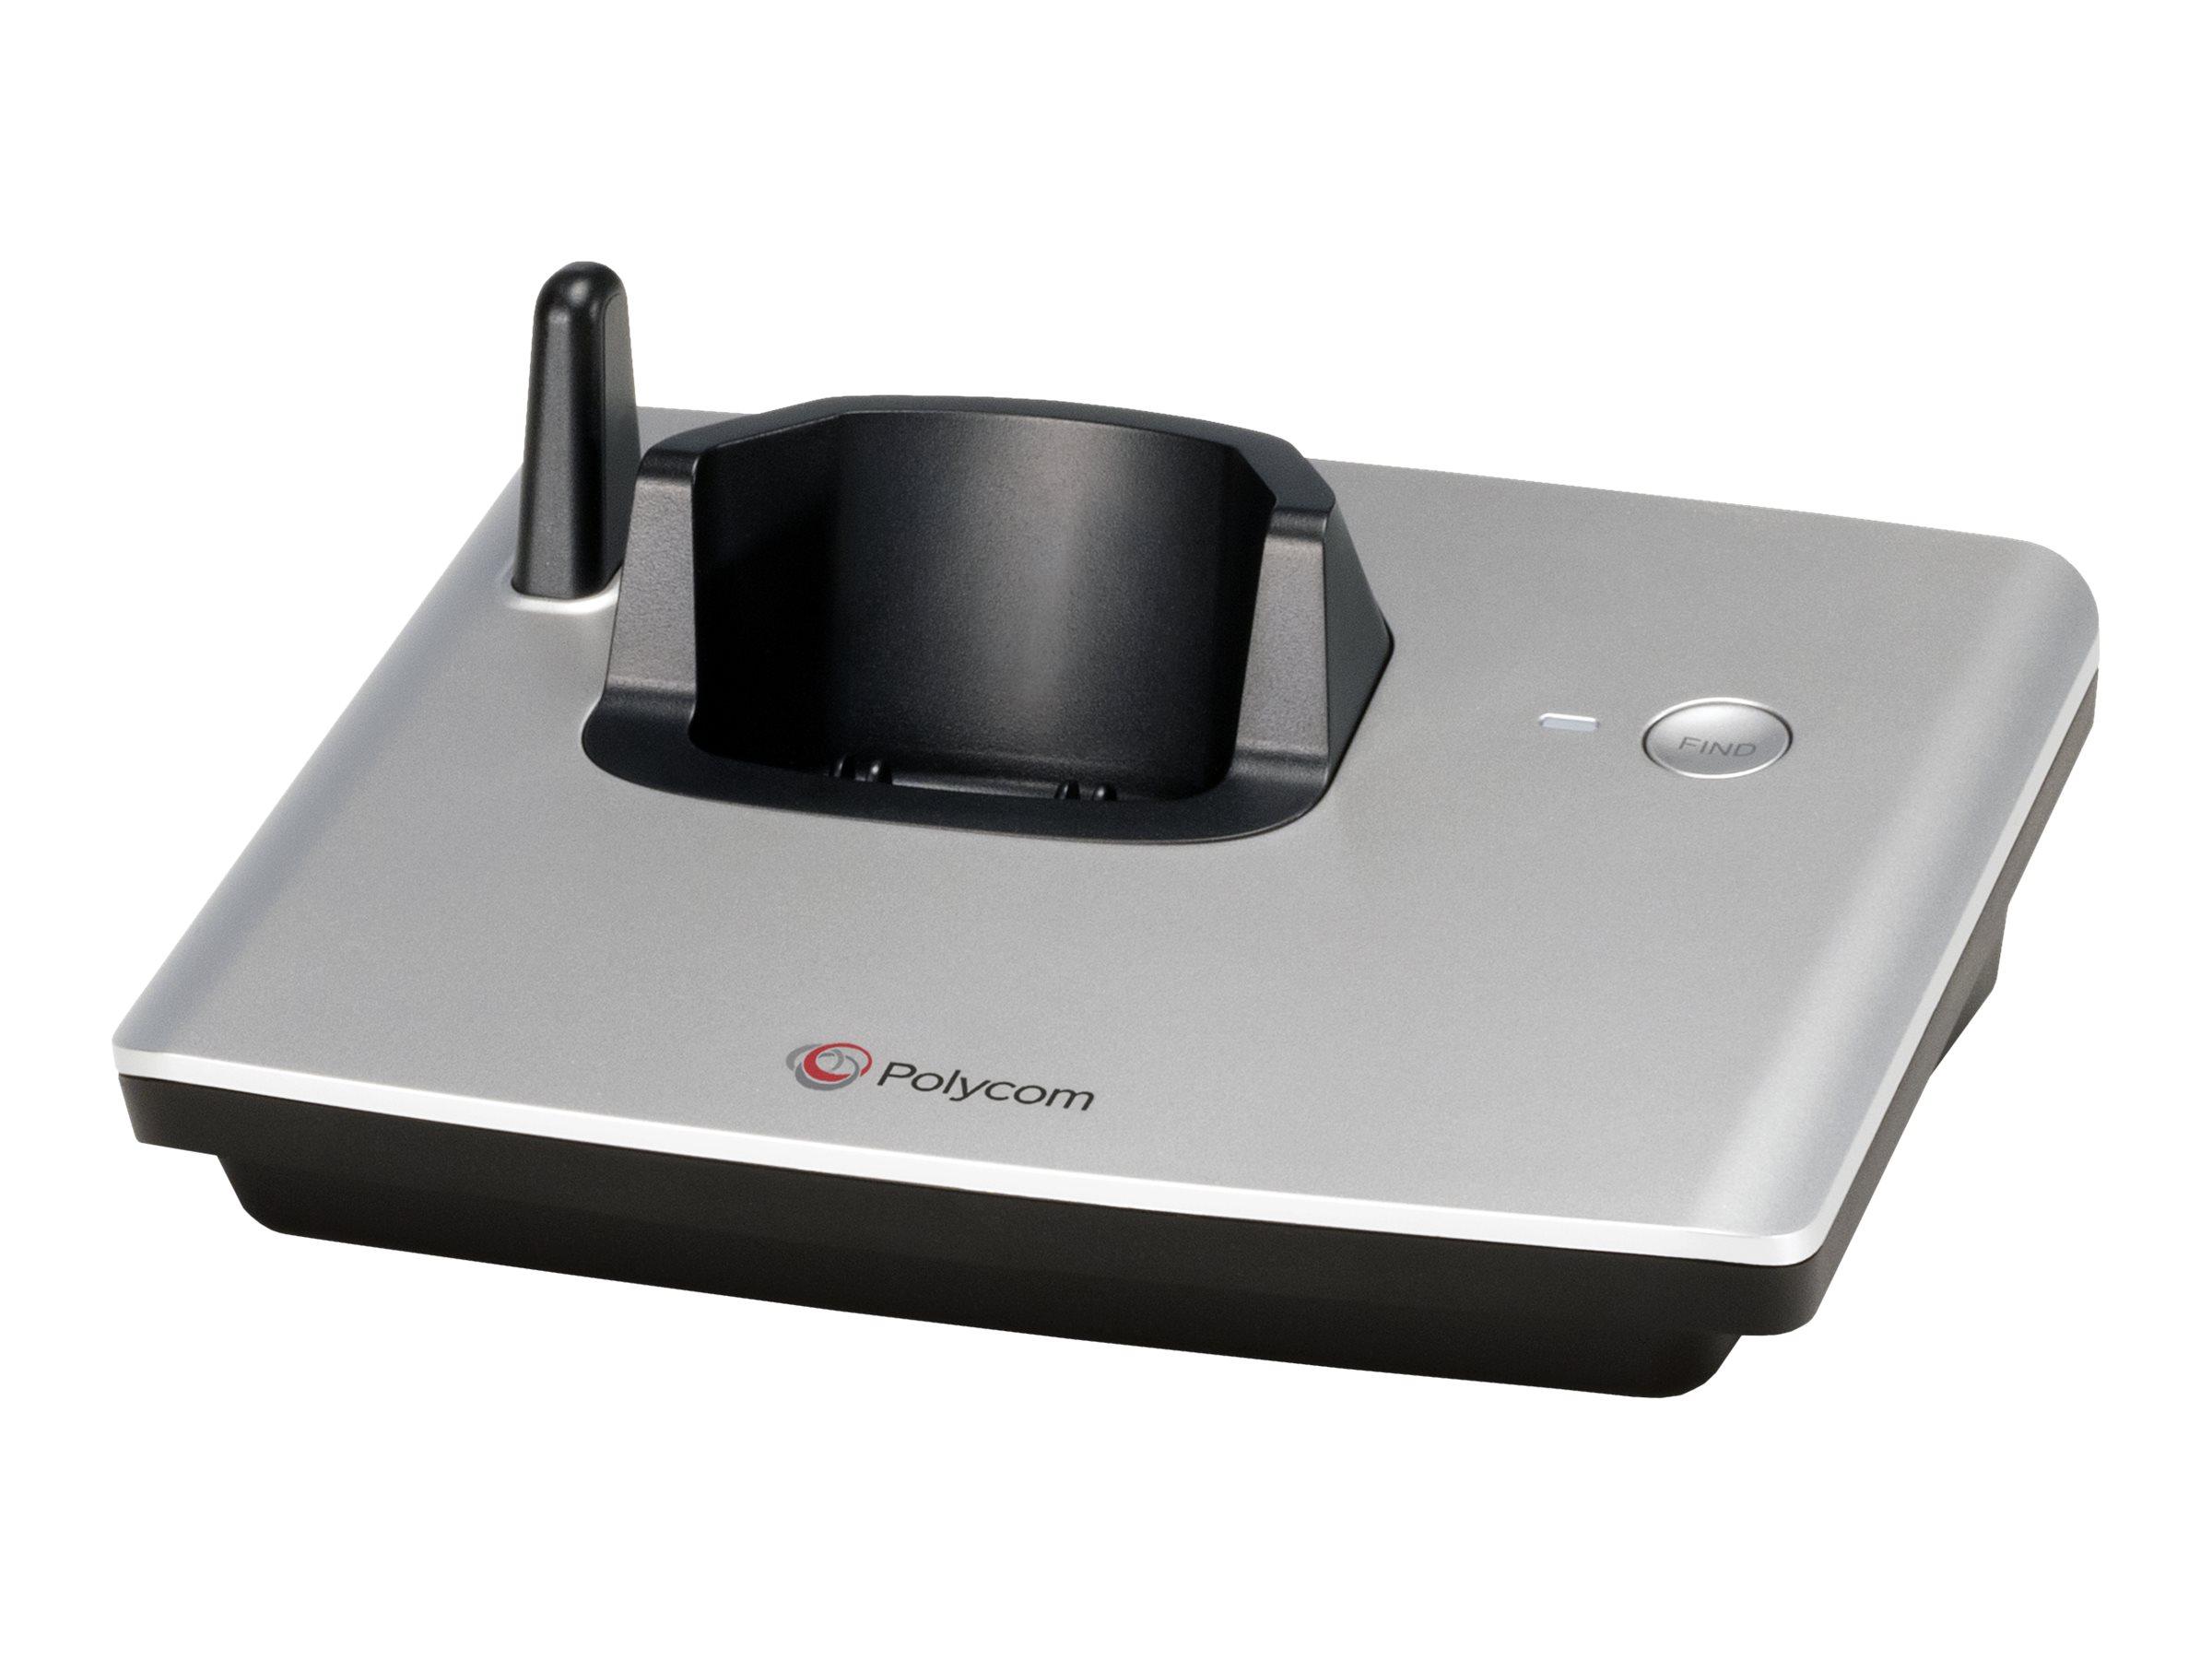 Polycom VVX D60 - Schnurloses VoIP-Telefon - DECT - SIP, SDP - 4 Leitungen